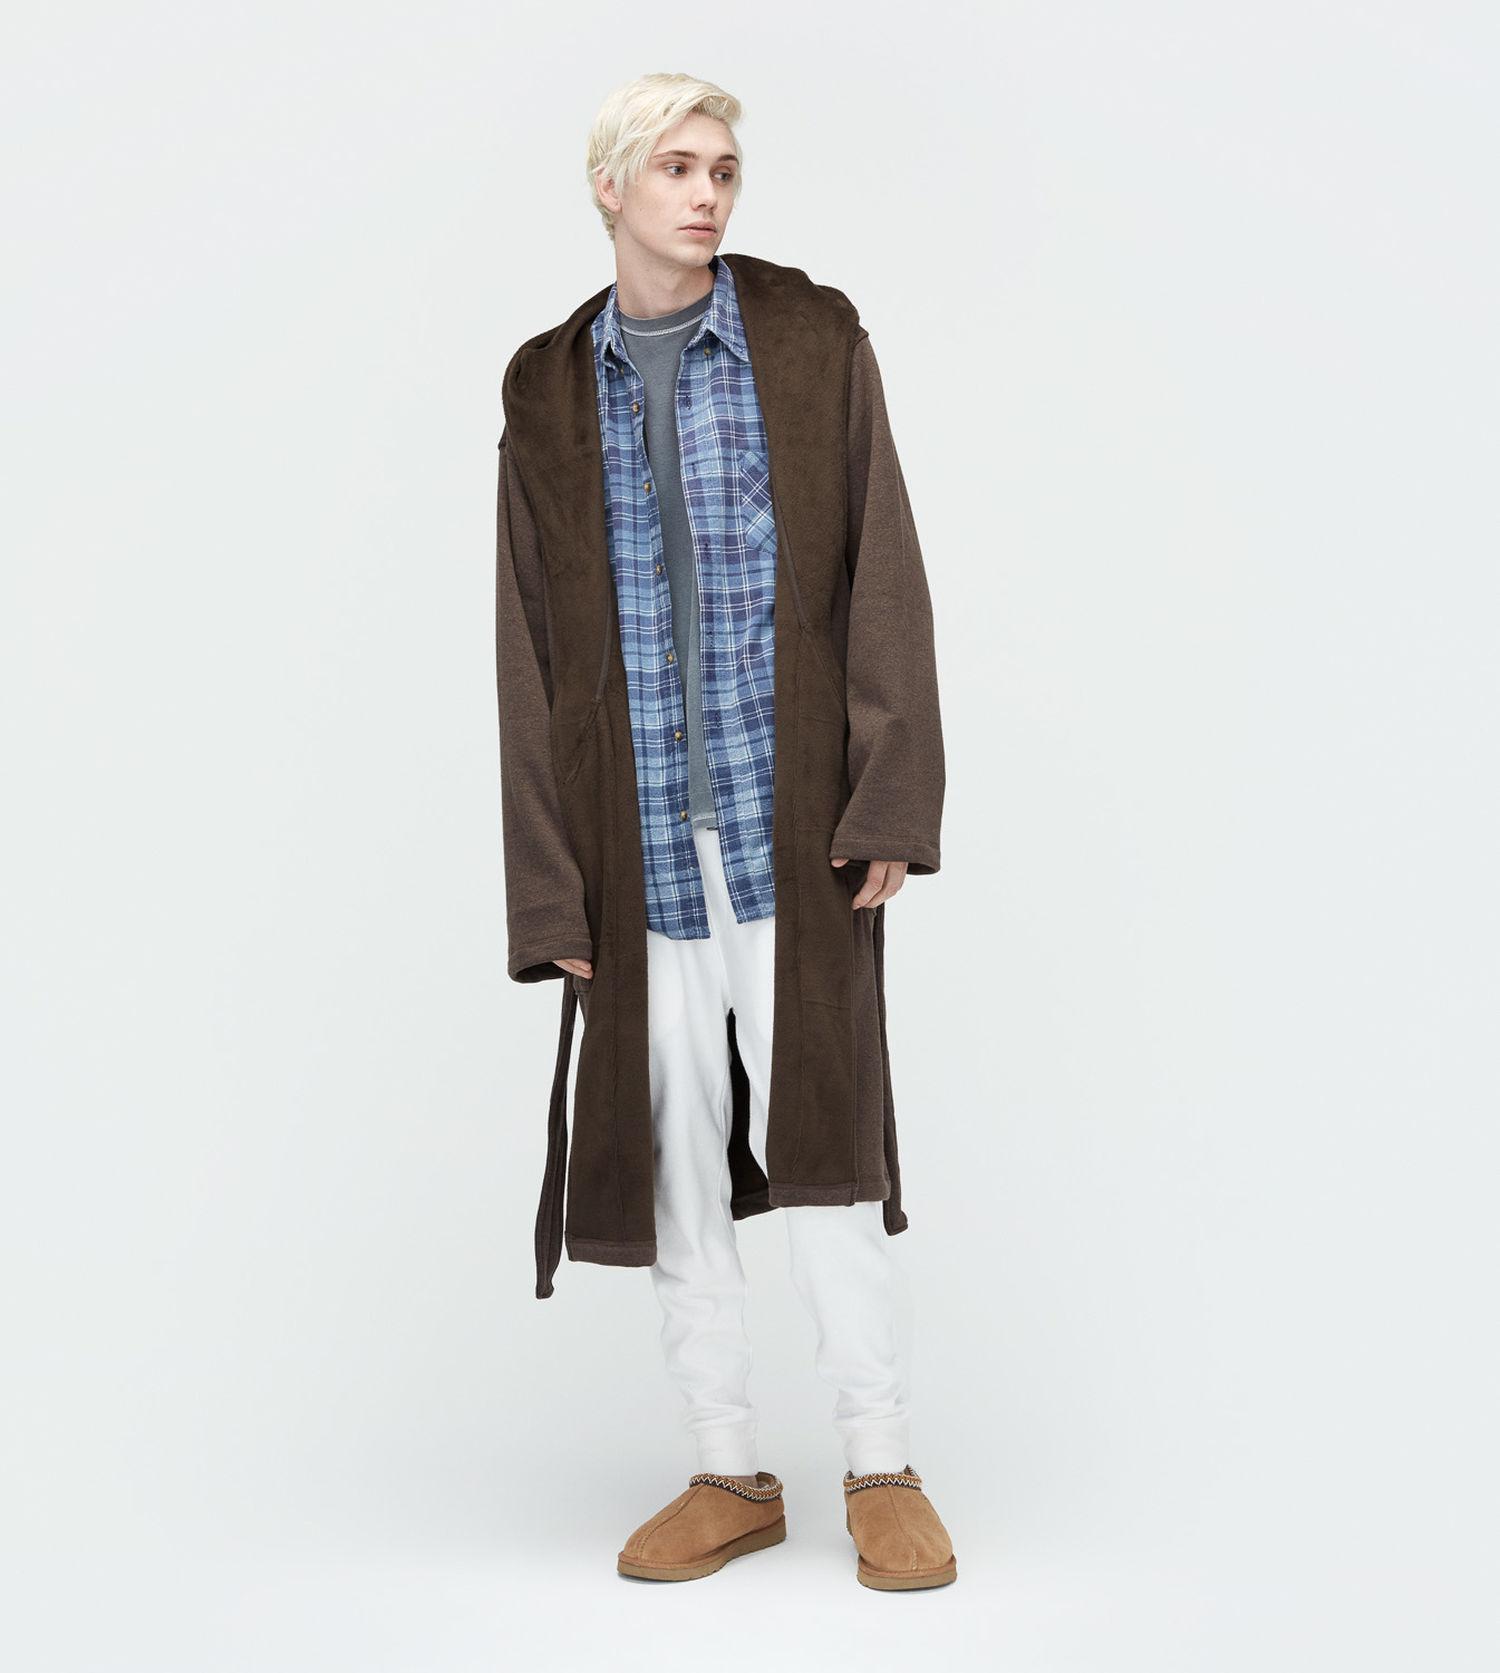 cb808707ba0 UGG Men's Brunswick Robe in Brown for Men - Lyst